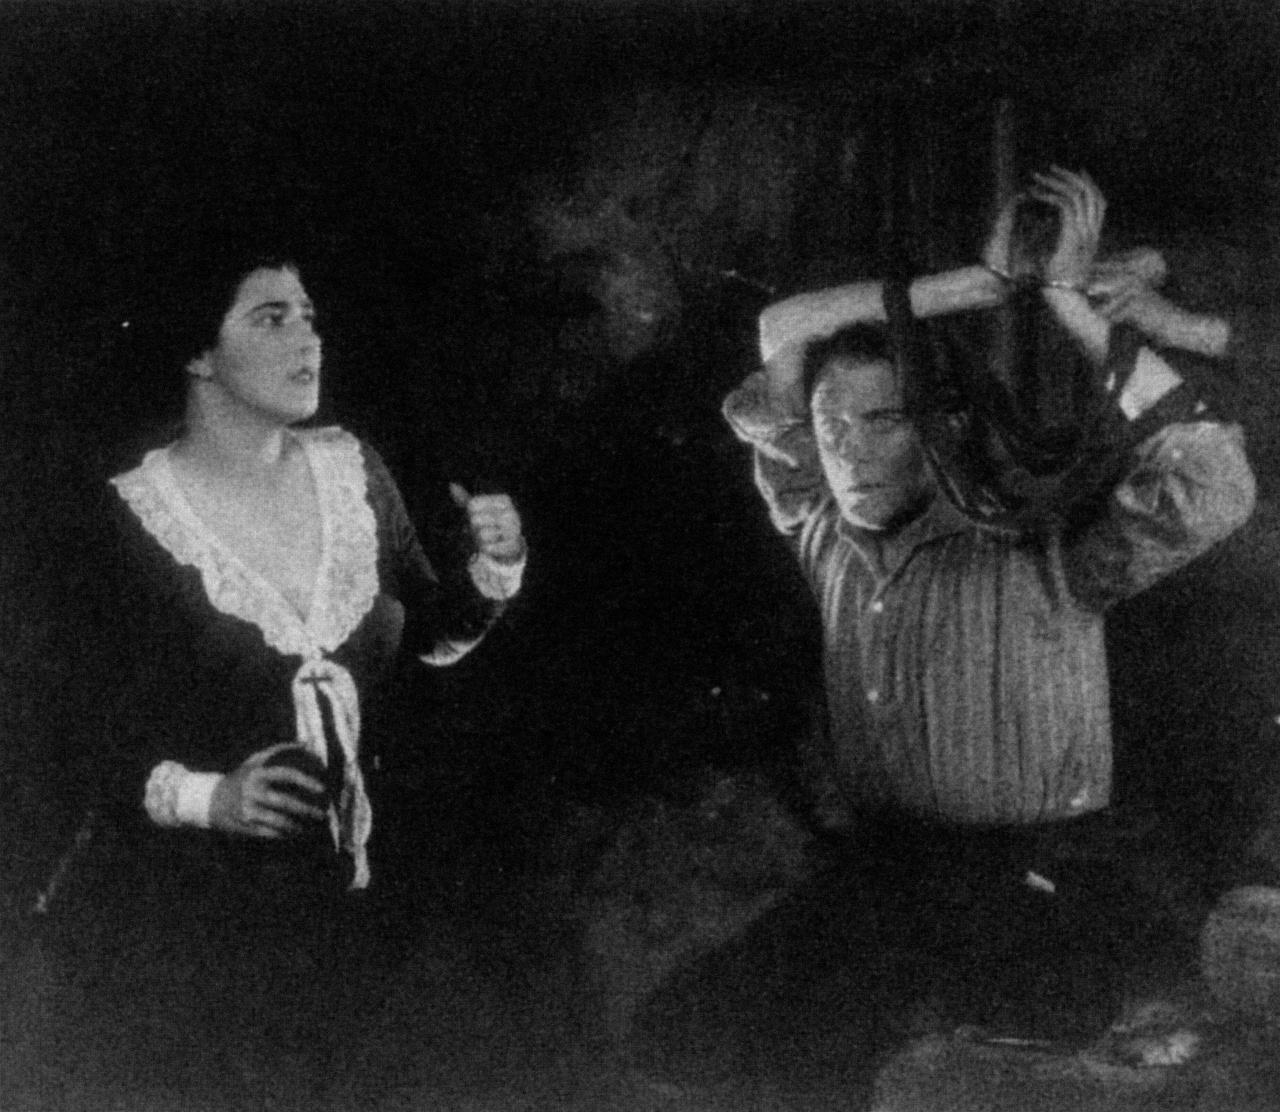 Nita Naldi and Malcolm Keen in The Mountain Eagle (1926, dir. Alfred Hitchcock)